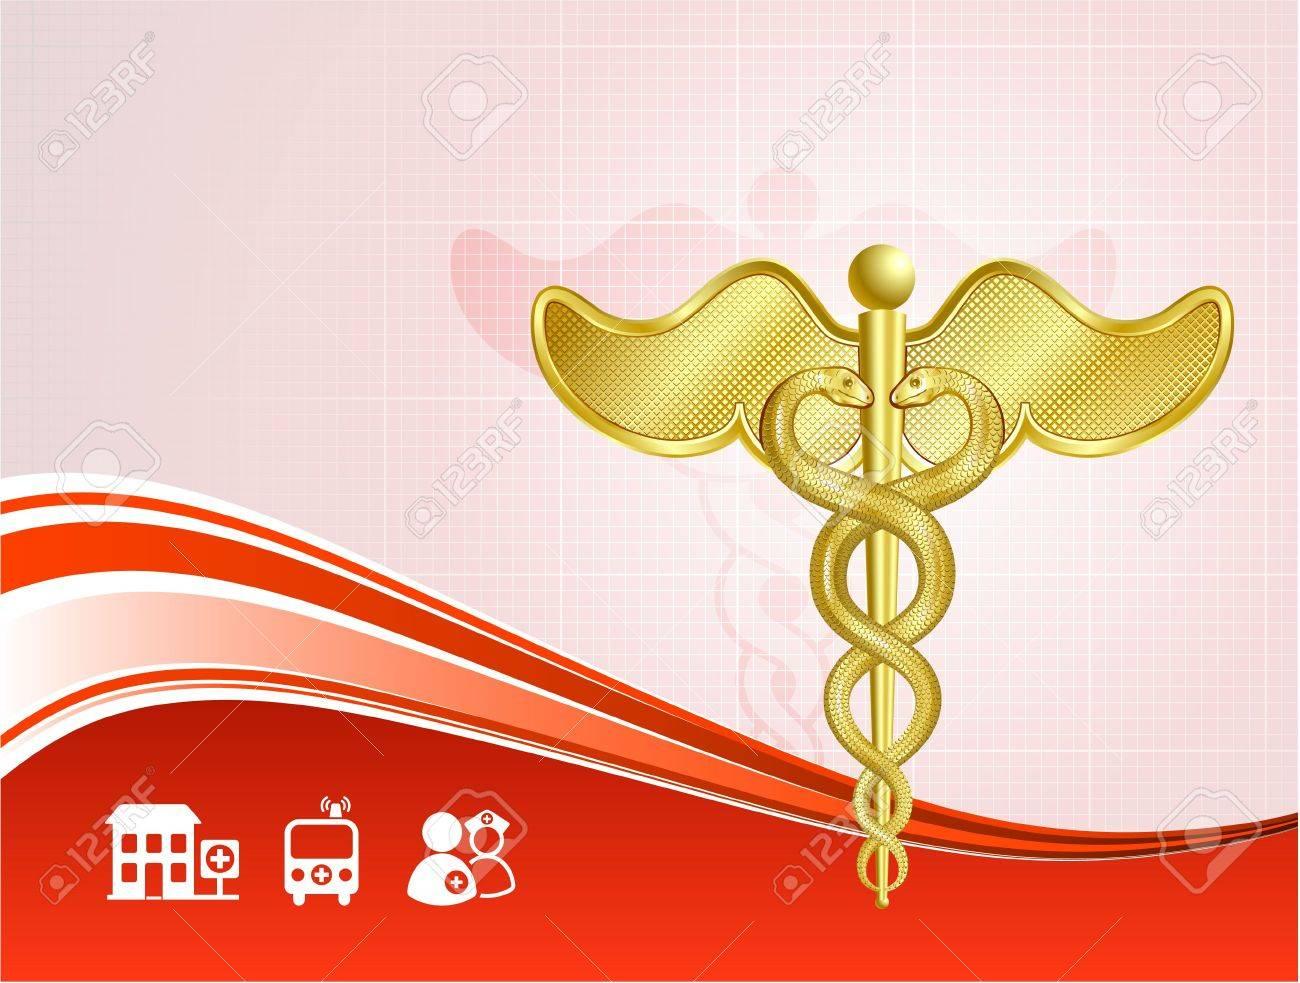 Original Illustration: Medical health care background AI8 compatible Stock Illustration - 6605102